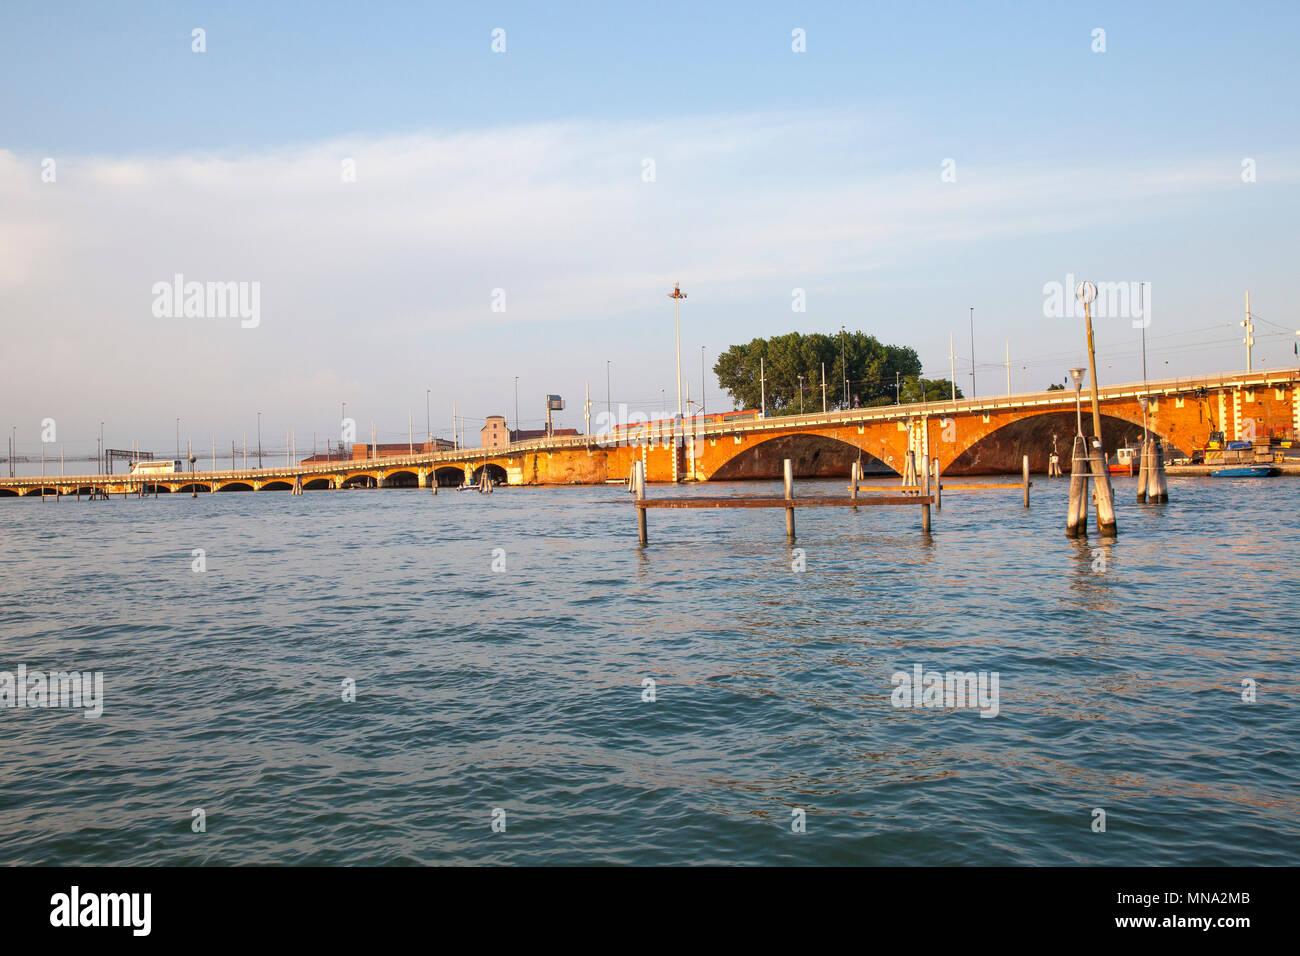 City Tram and van crossing Ponte della Liberta over the Venetian lagoon connecting Venice historic centre with Mestre, Venice, Veneto, Italy at sunset - Stock Image